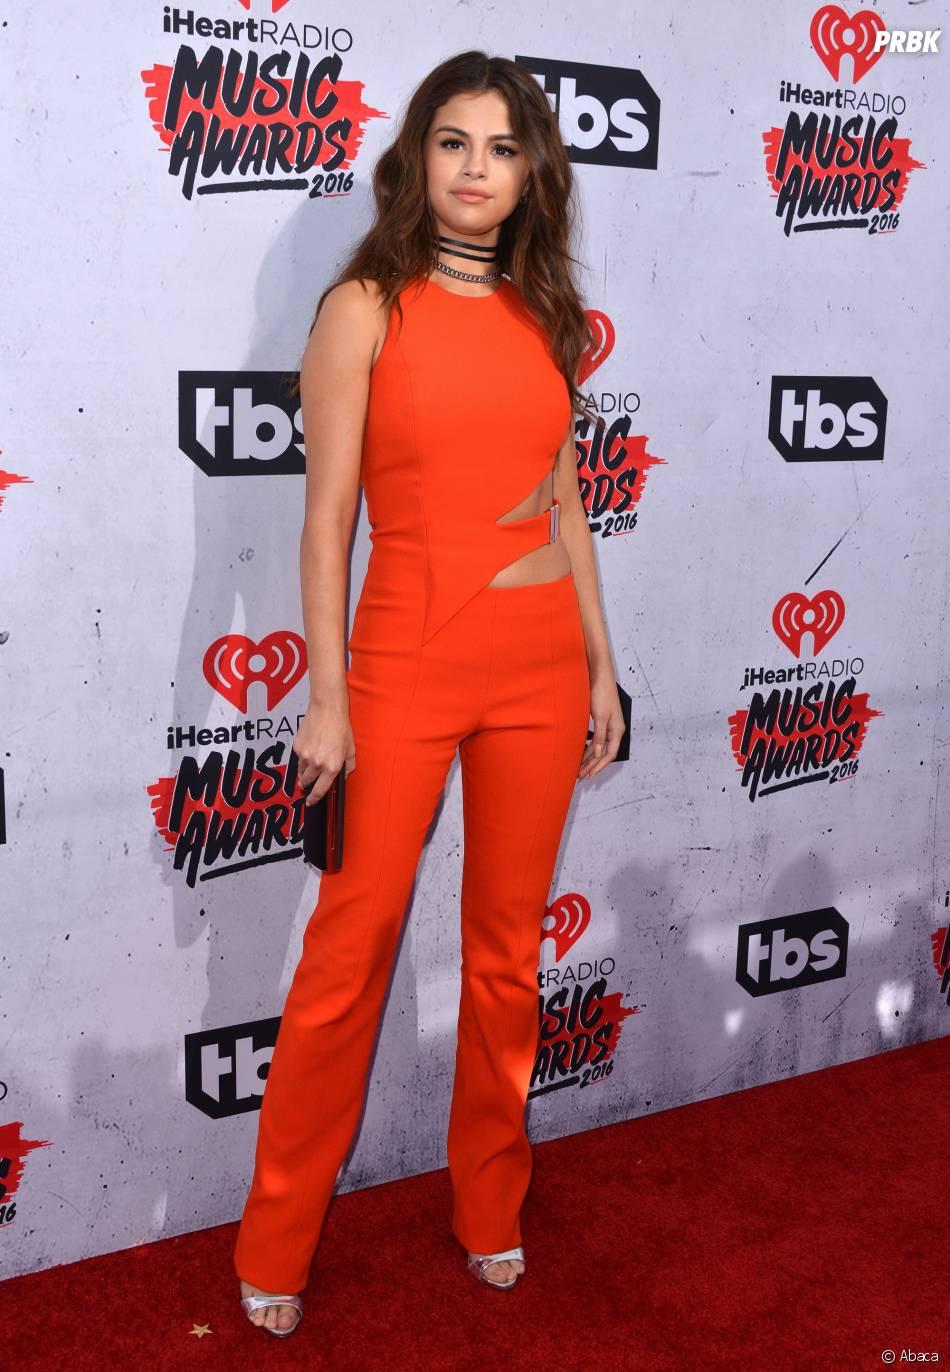 Selena Gomez sexy aux iHeartRadio Music Awards 2016 le 3 avril à Los Angeles